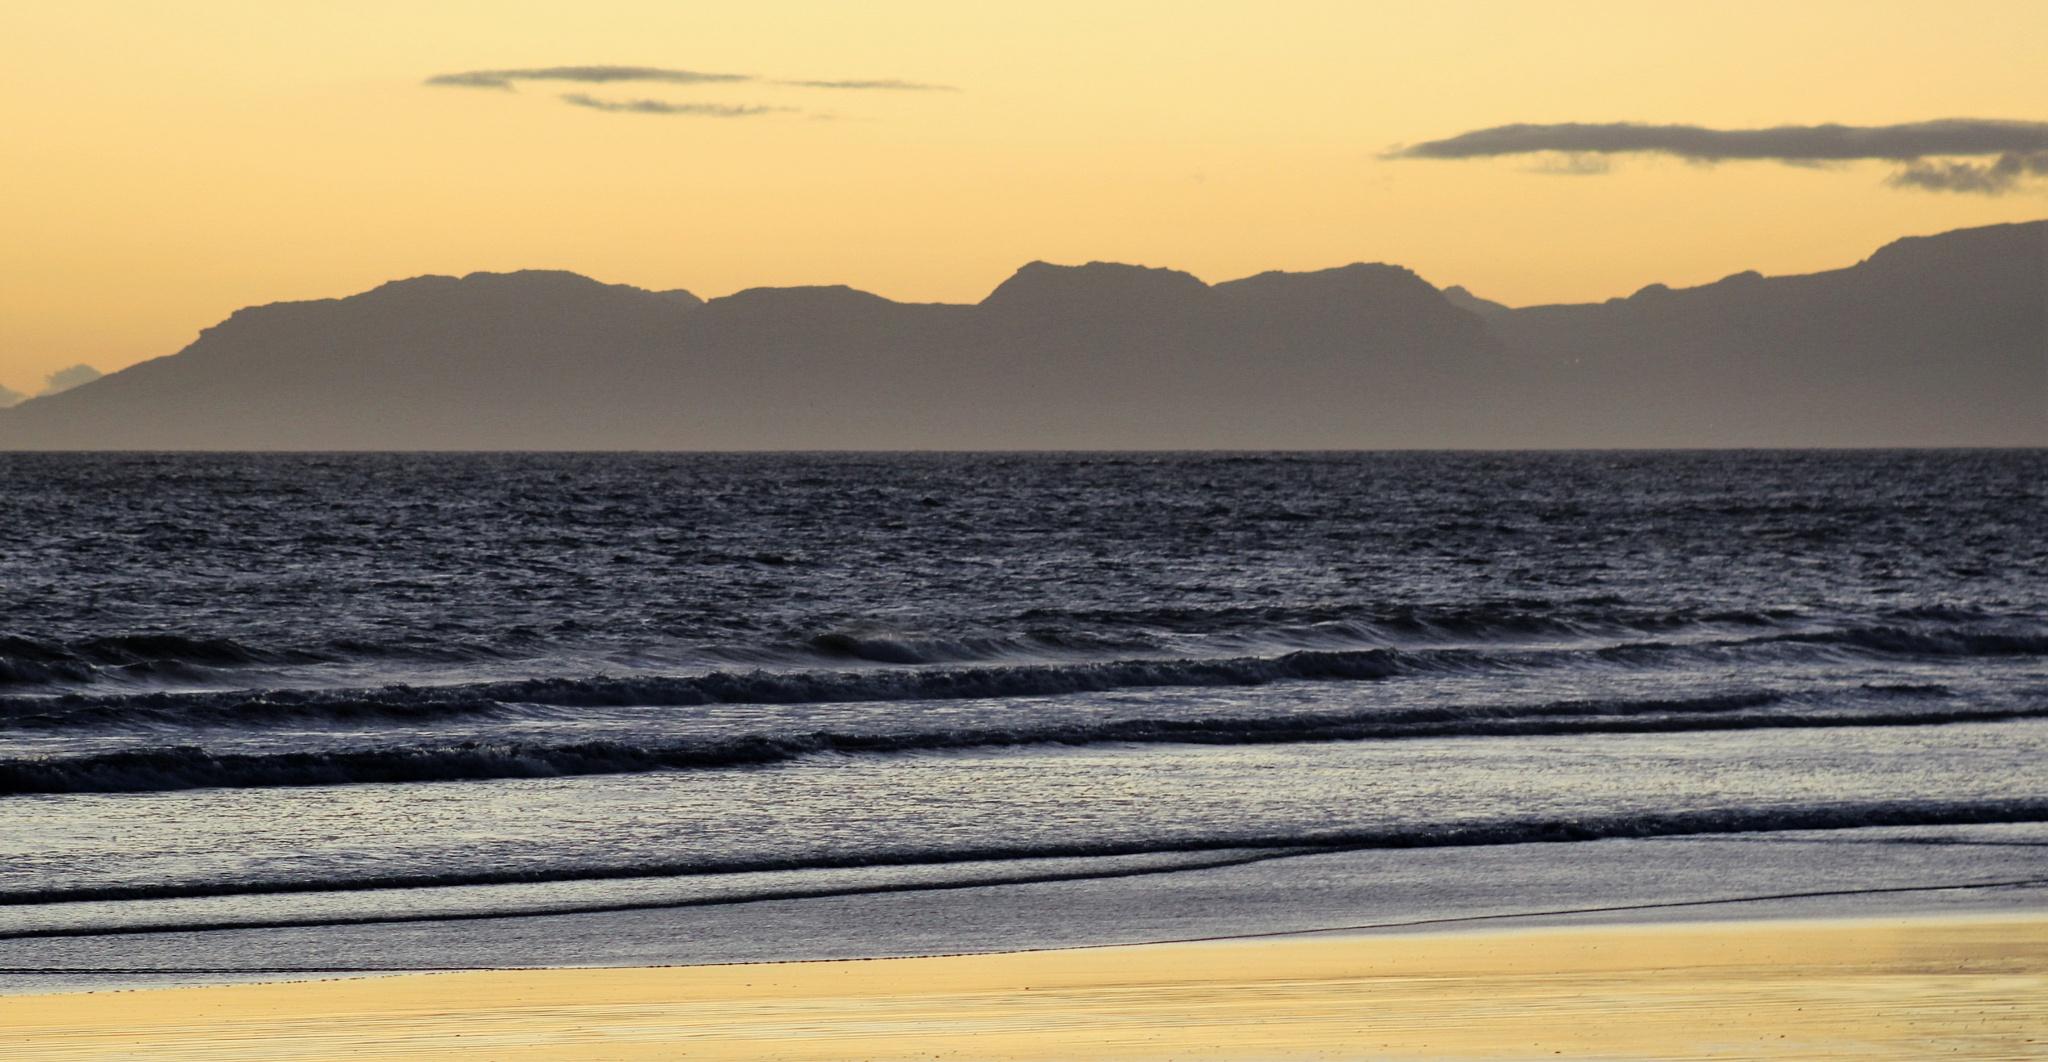 TABLEMOUNTAIN SOUTH AFRICA  by Zorana Zee Grobbelaar